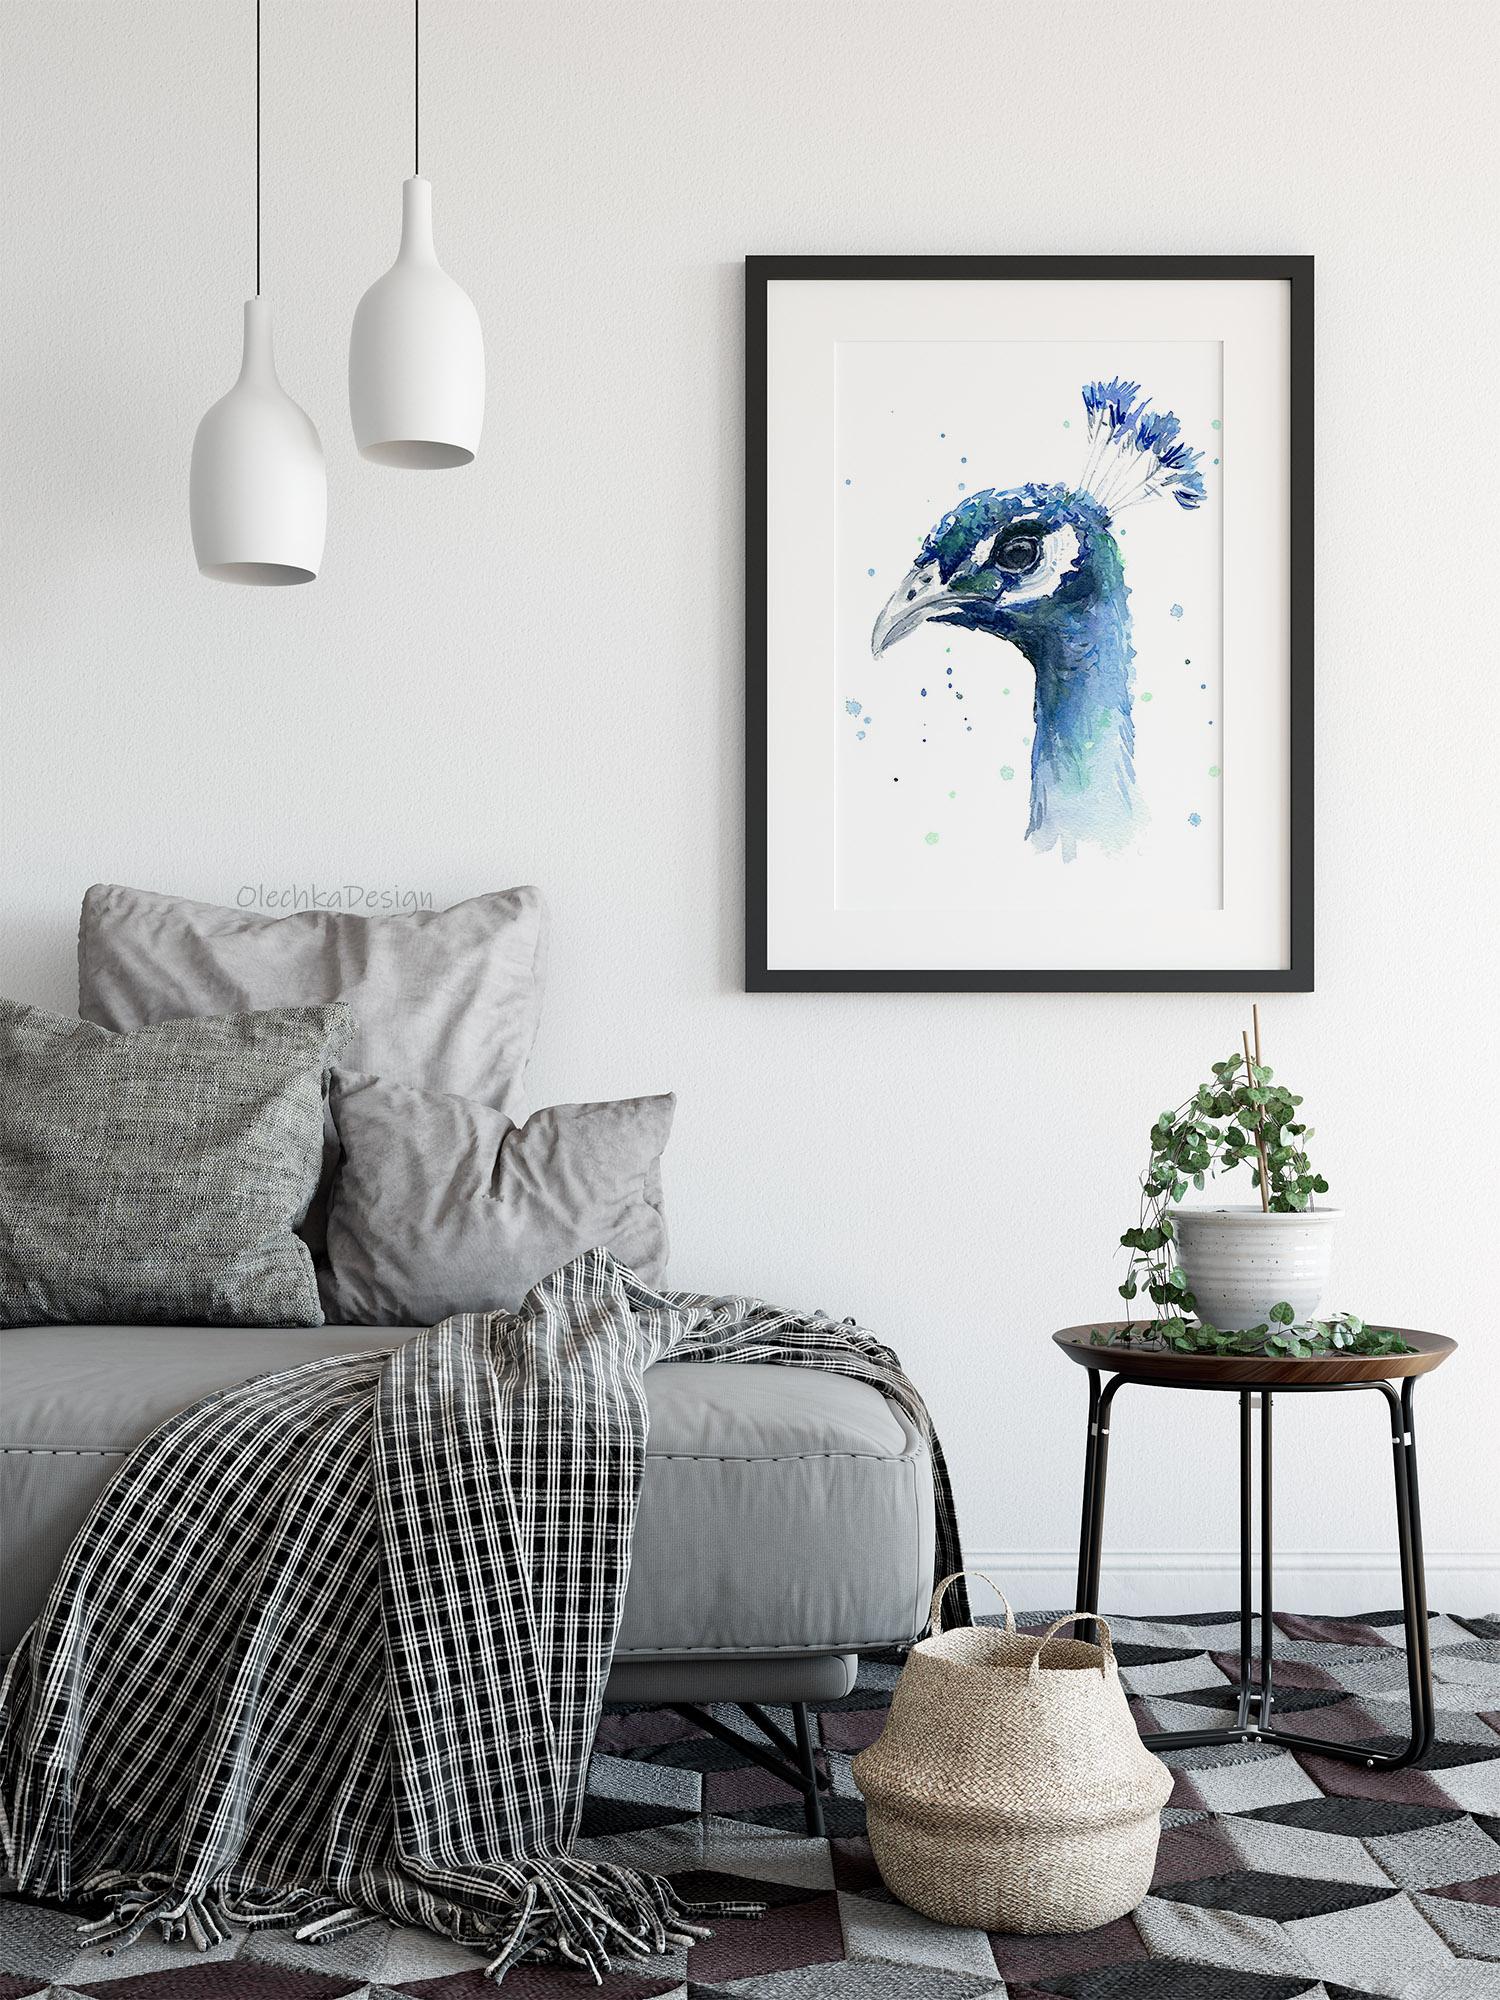 peacock-wall-art-print.jpg